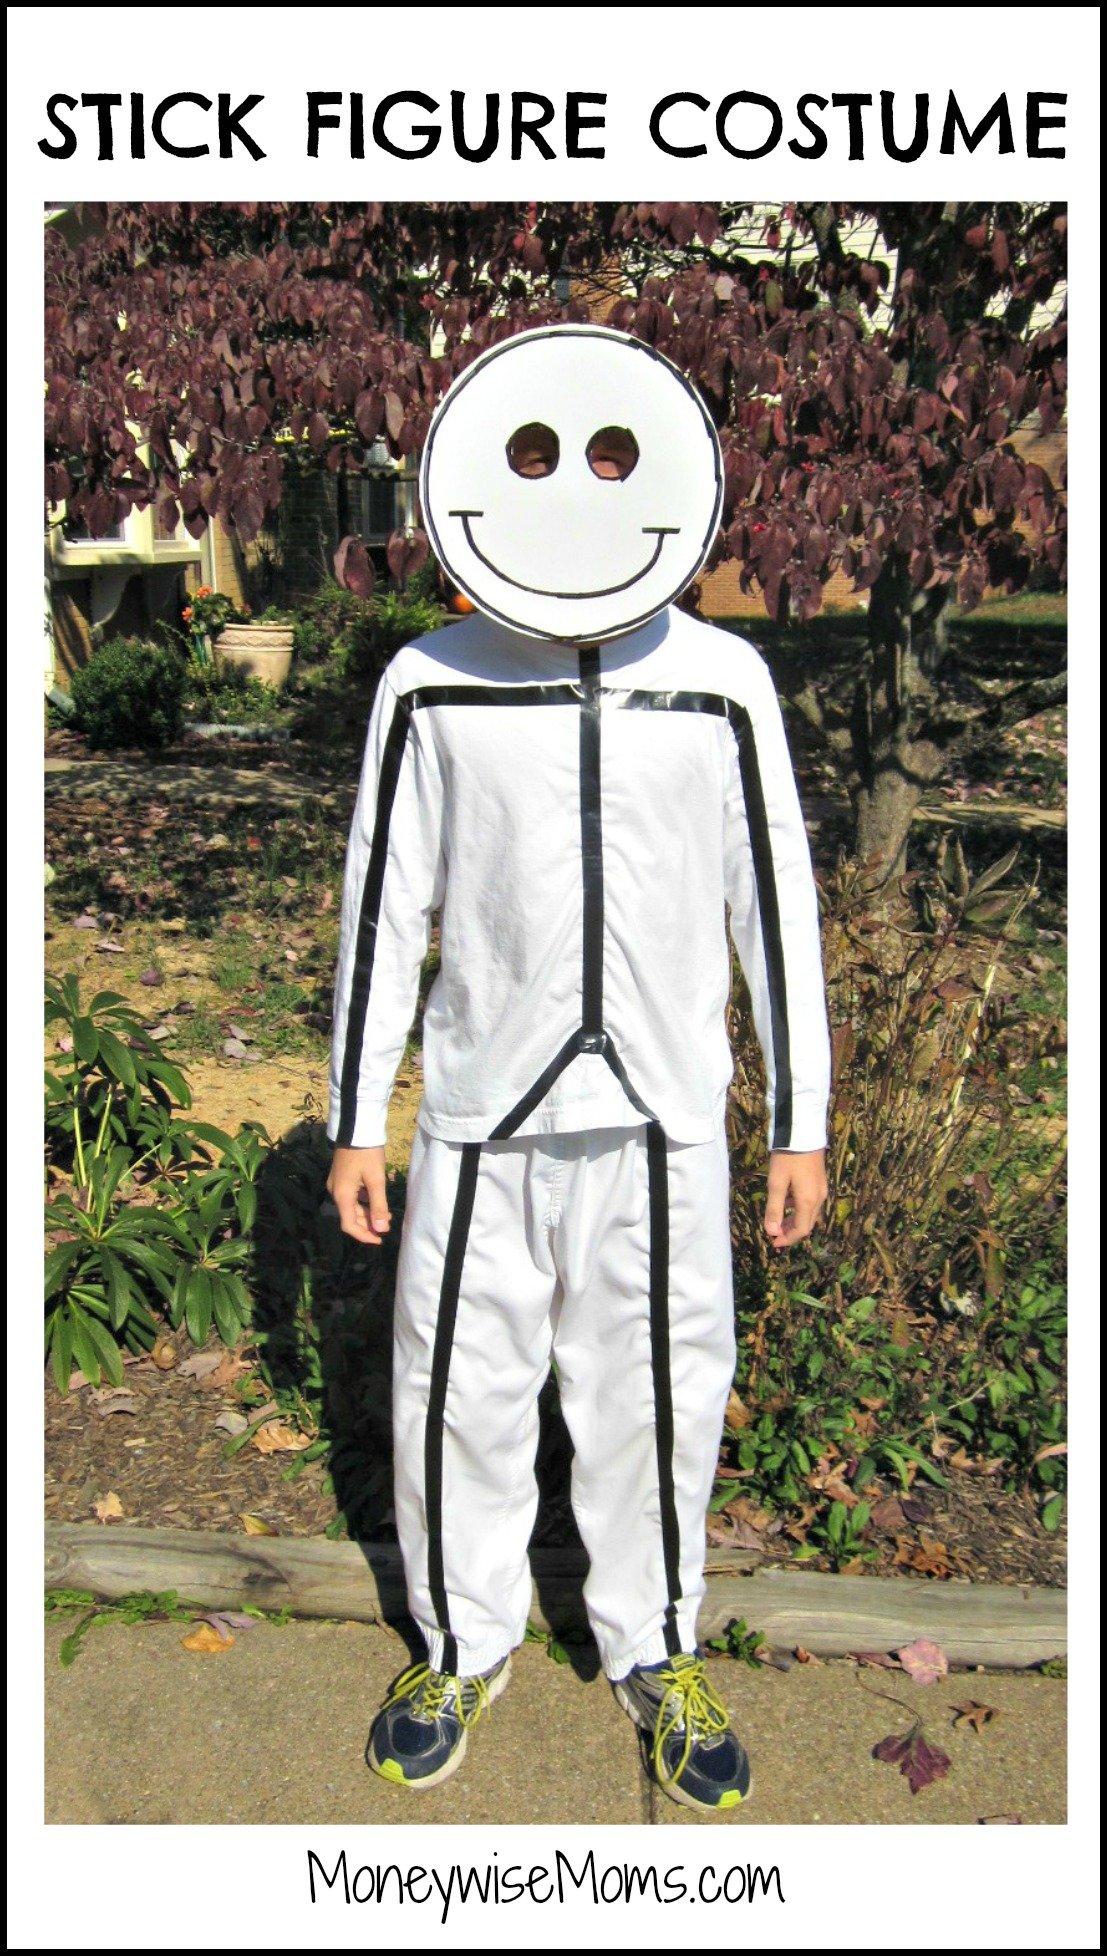 Stick Figure Costume for Halloween